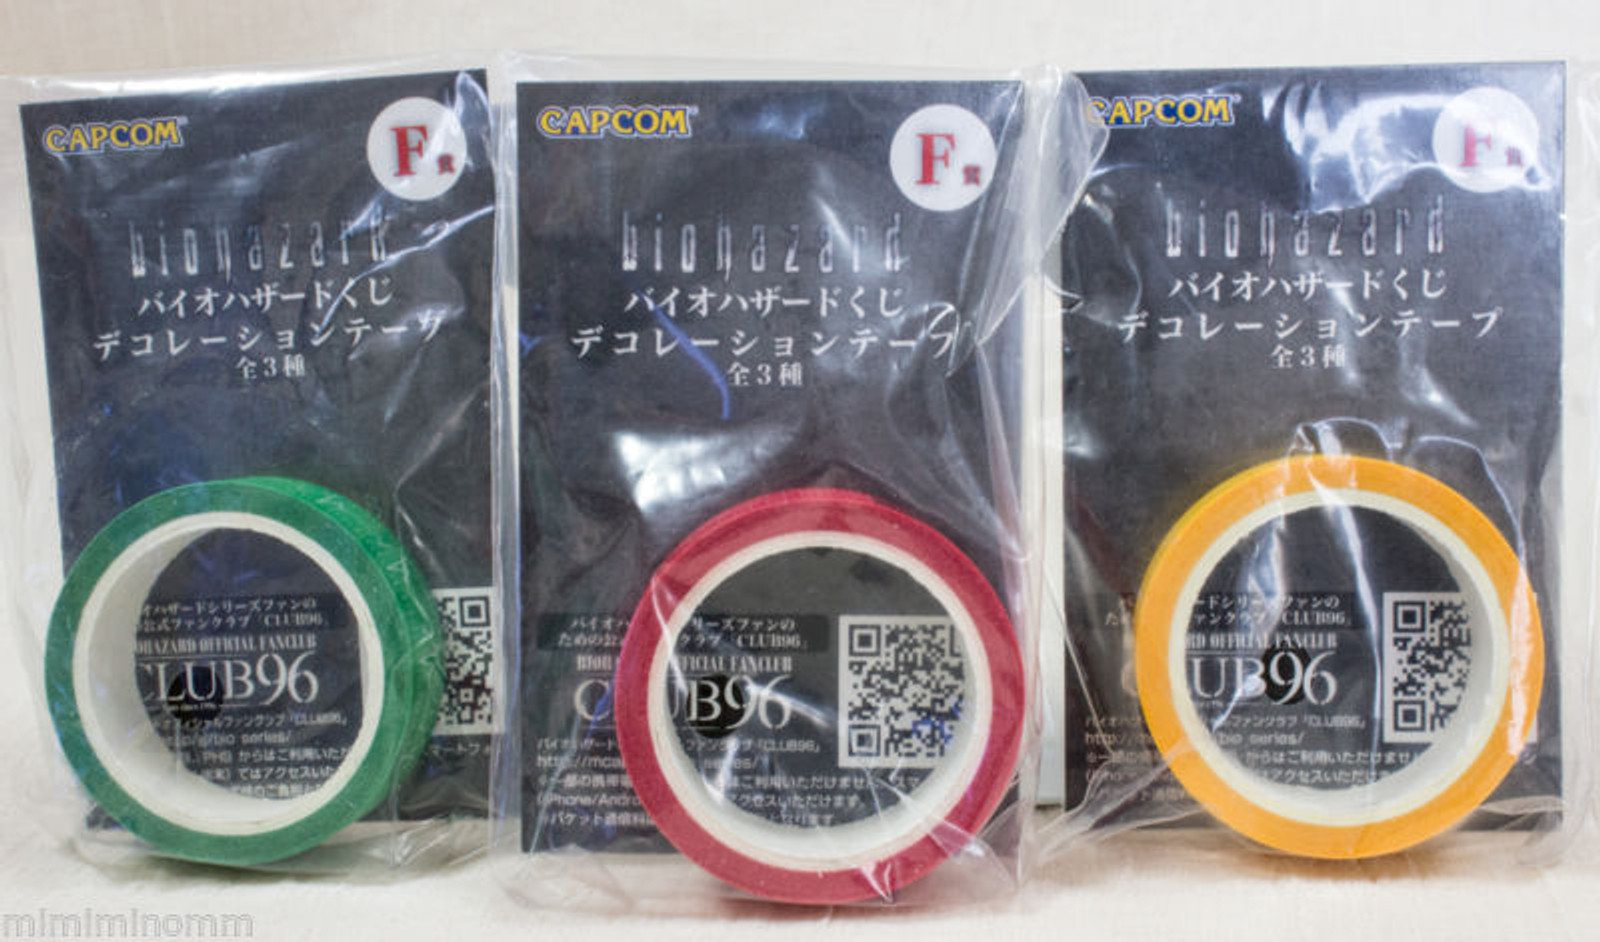 Set of 3 colors Biohazard Decoration Tape Capcom JAPAN GAME RESIDENT EVIL